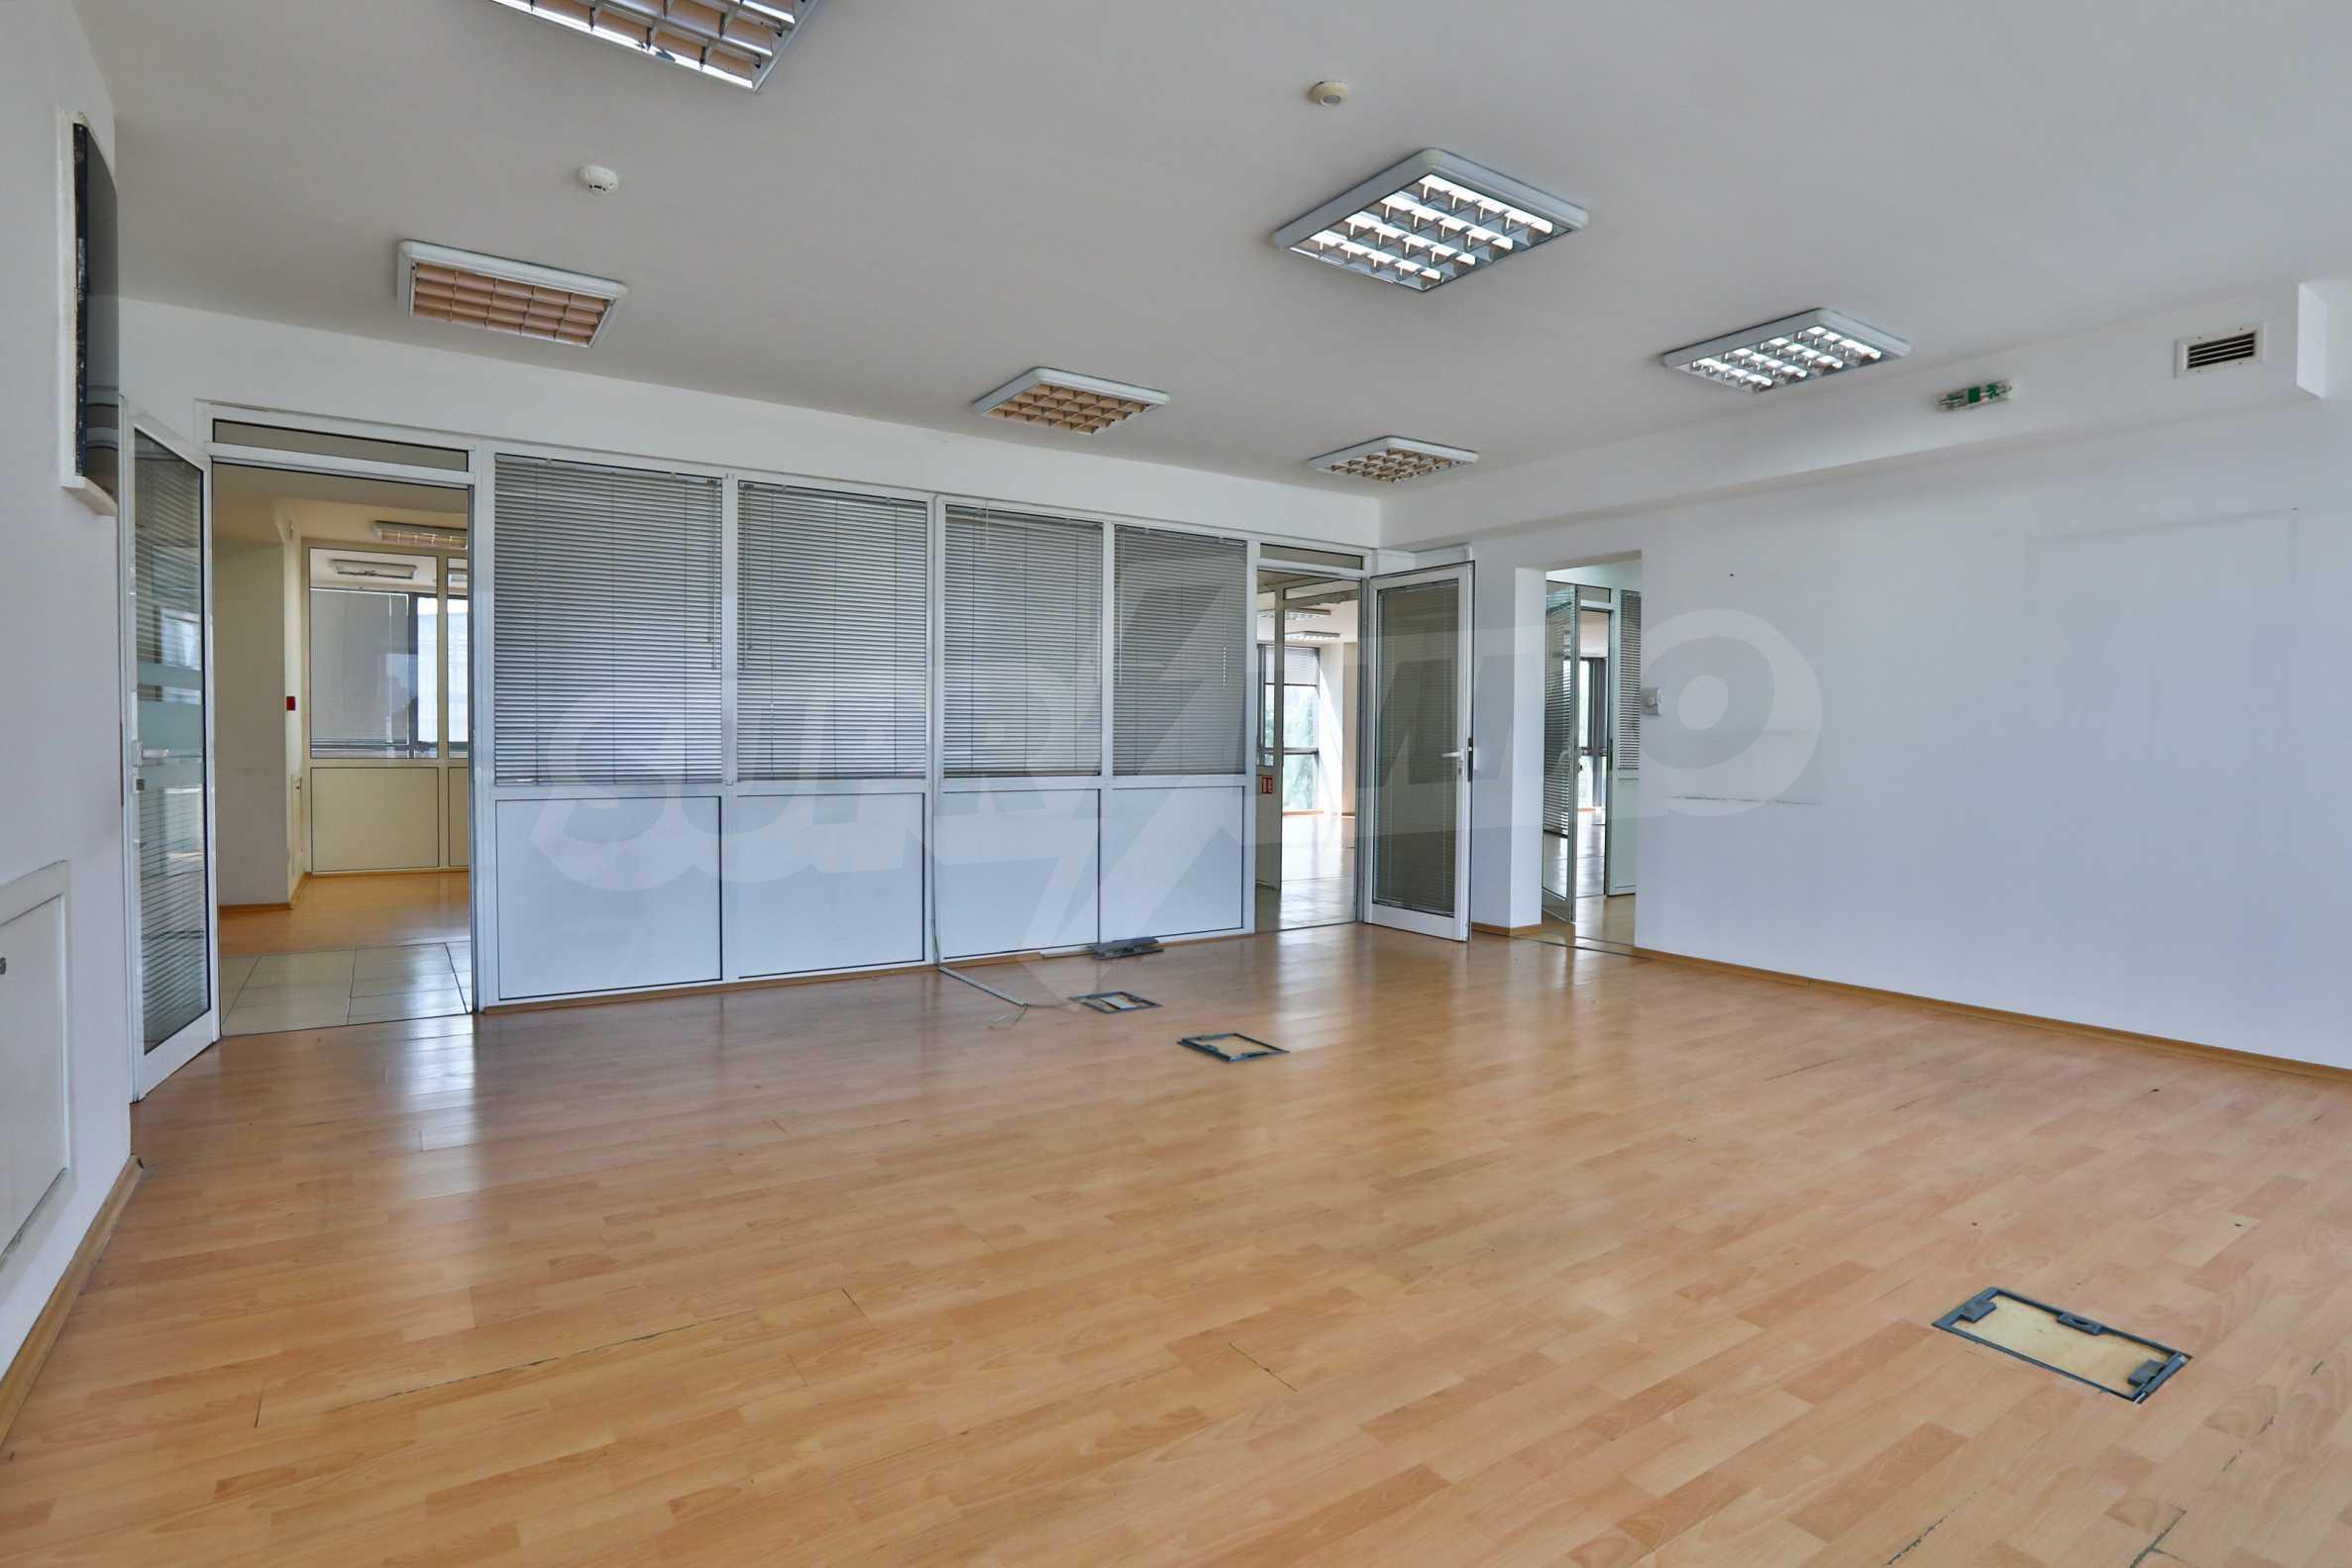 Офис в бизнес сграда висок клас на бул. Цариградско шосе 22